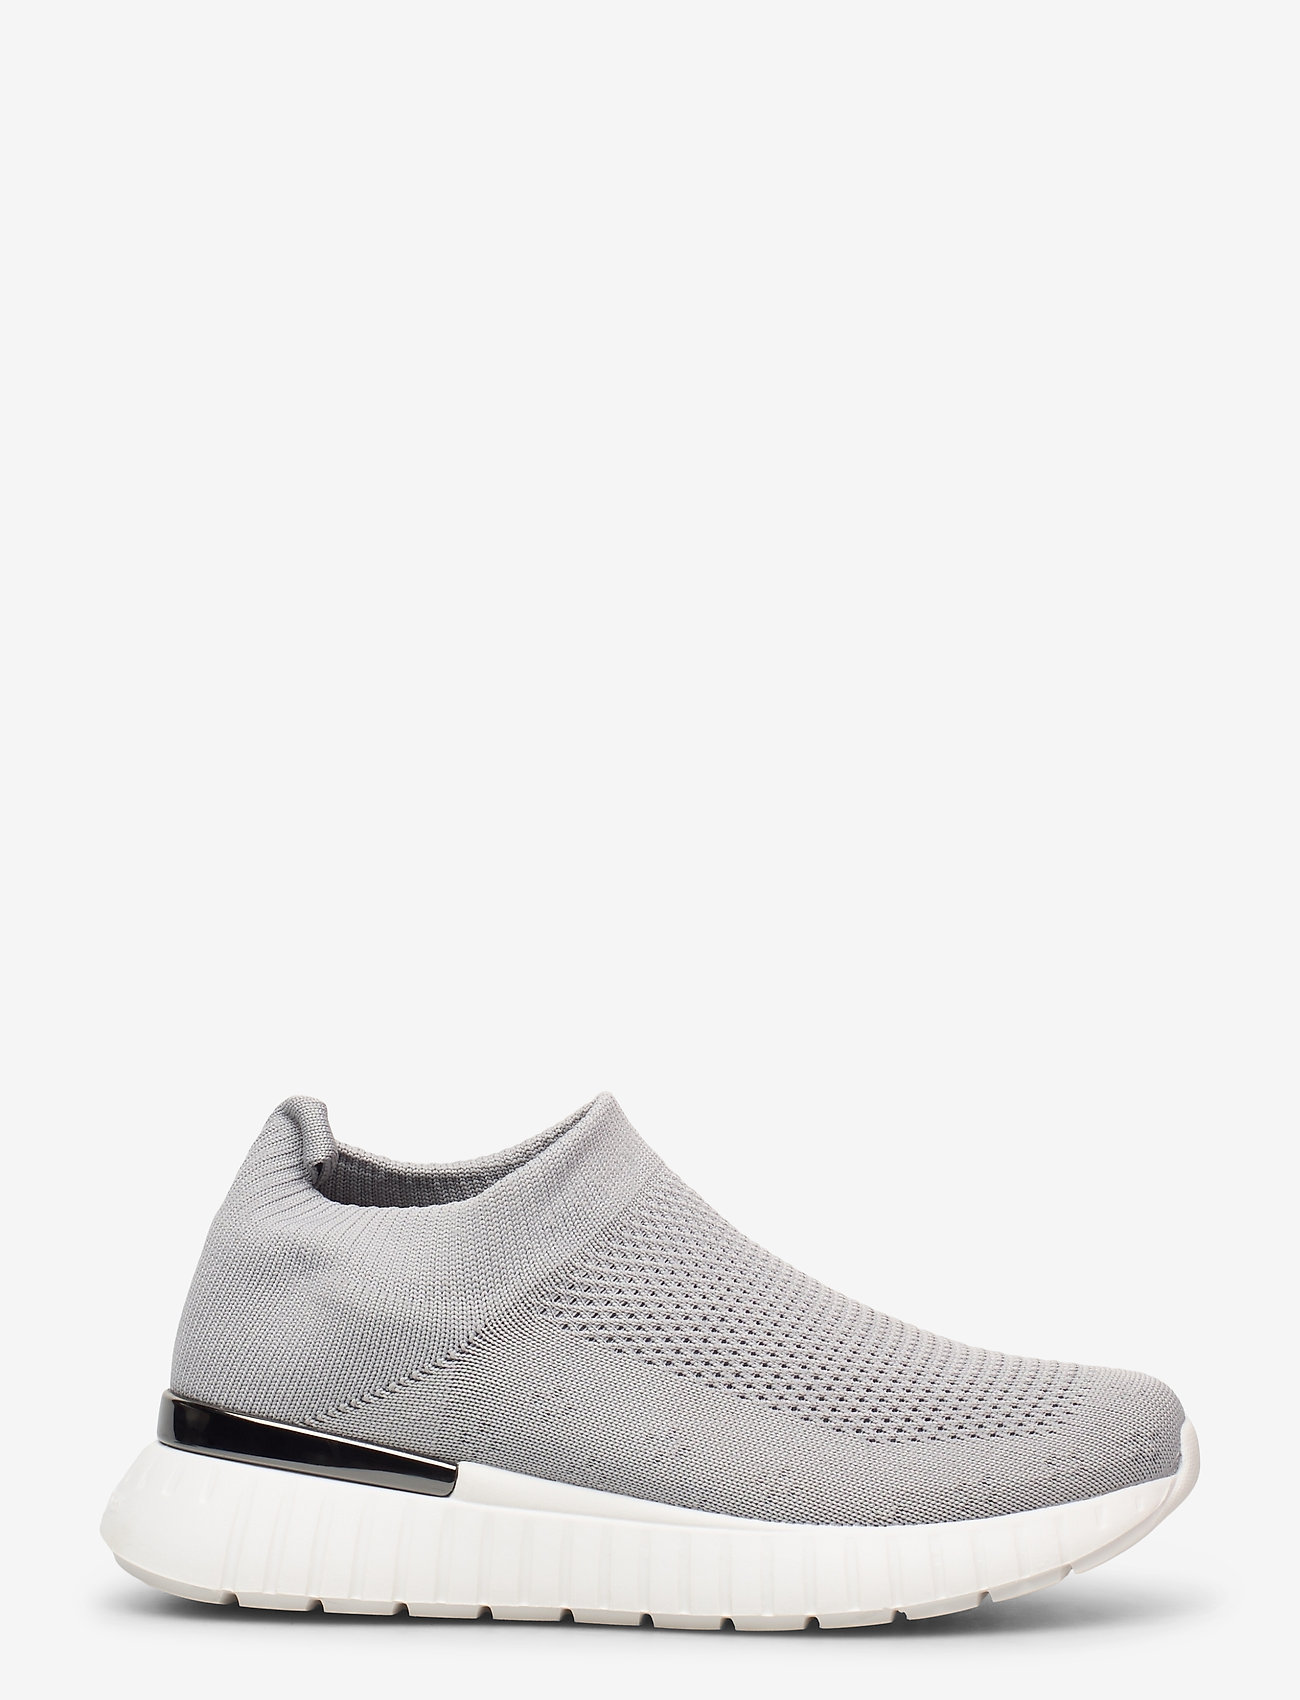 Ilse Jacobsen - Sneakers - slip-on sneakers - grey - 1